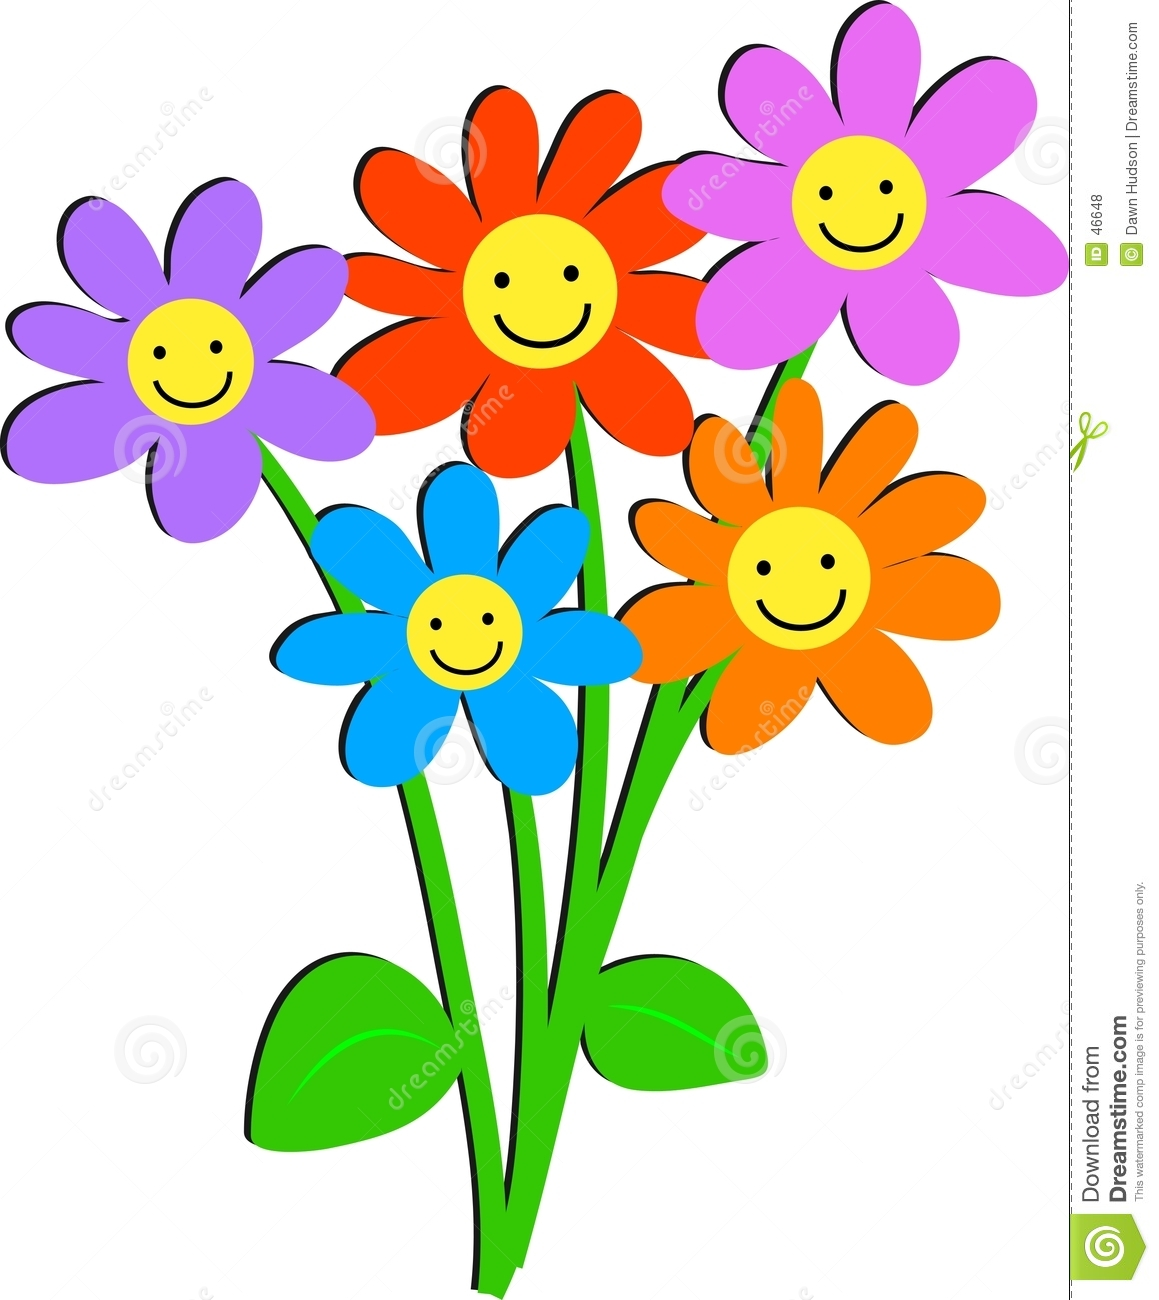 1159x1300 Smiley Face Flower Clipart Clipart Panda